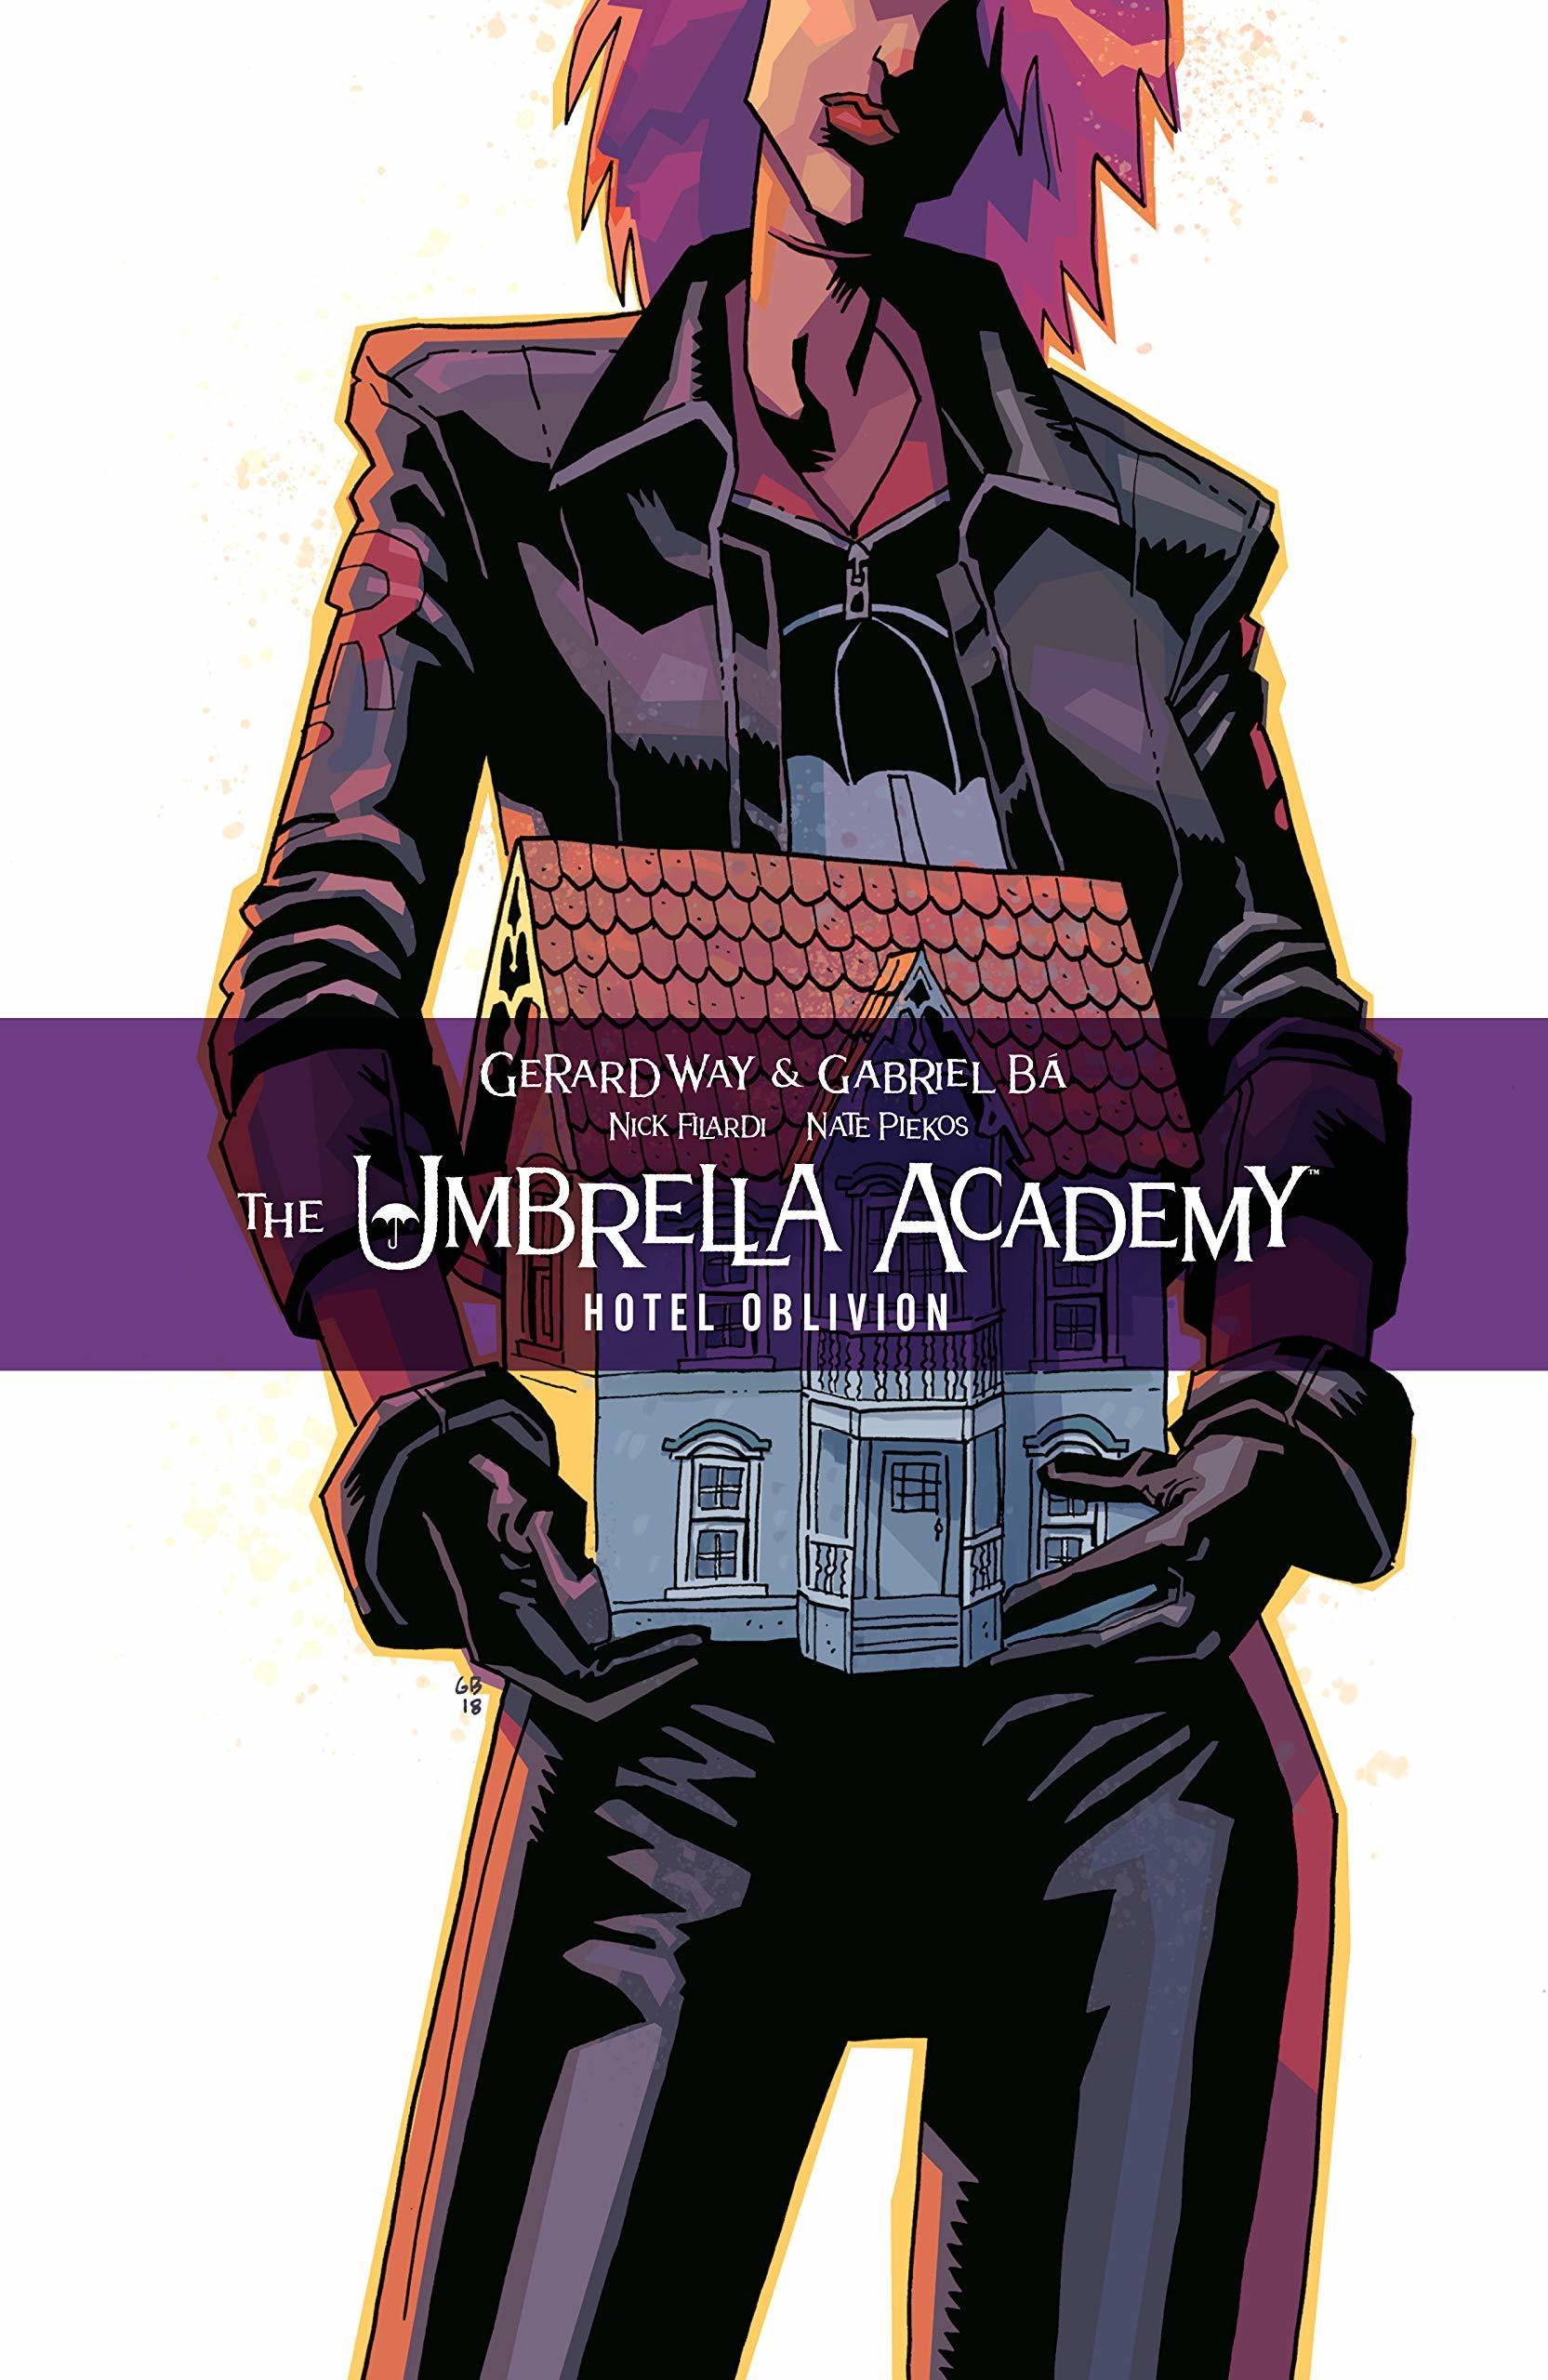 The Umbrella Academy Vol. 3: Hotel Oblivion (The Umbrella Academy, #3)